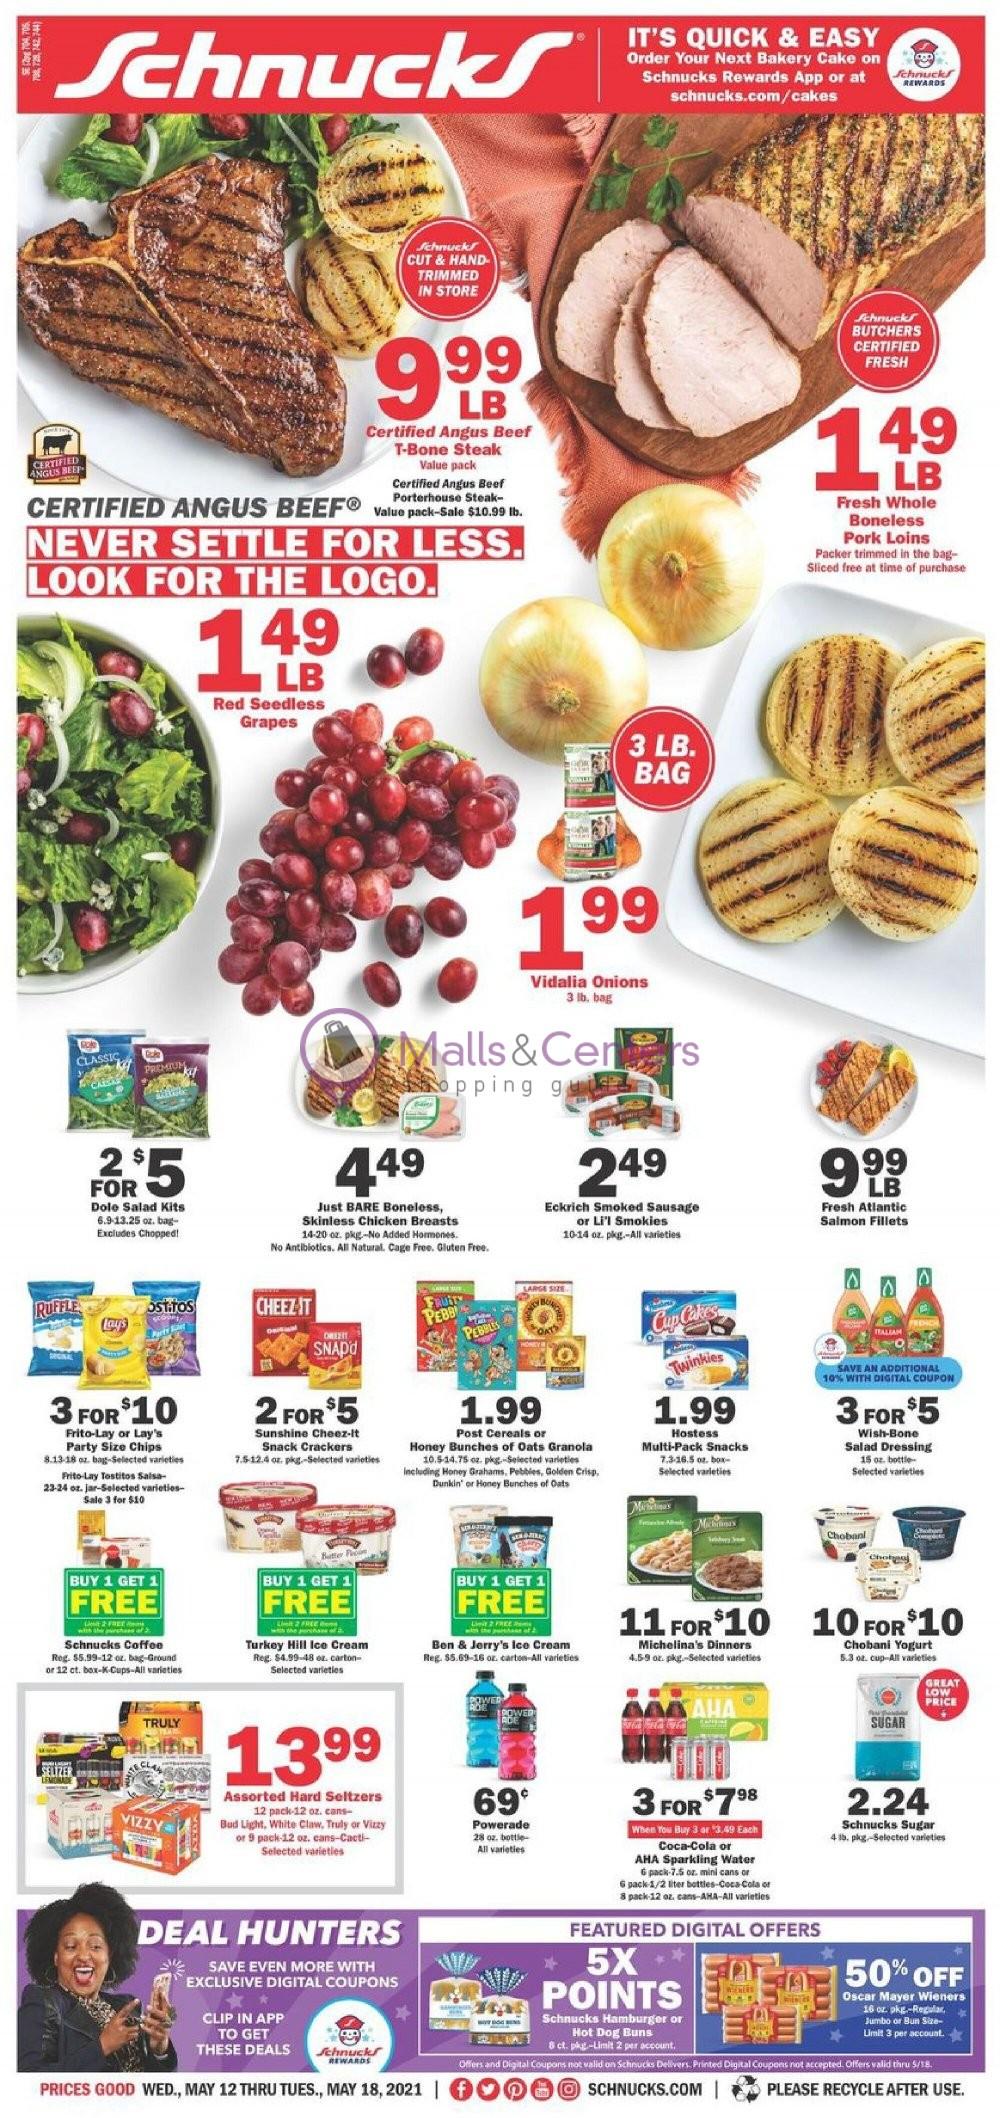 weekly ads Schnucks - page 1 - mallscenters.com